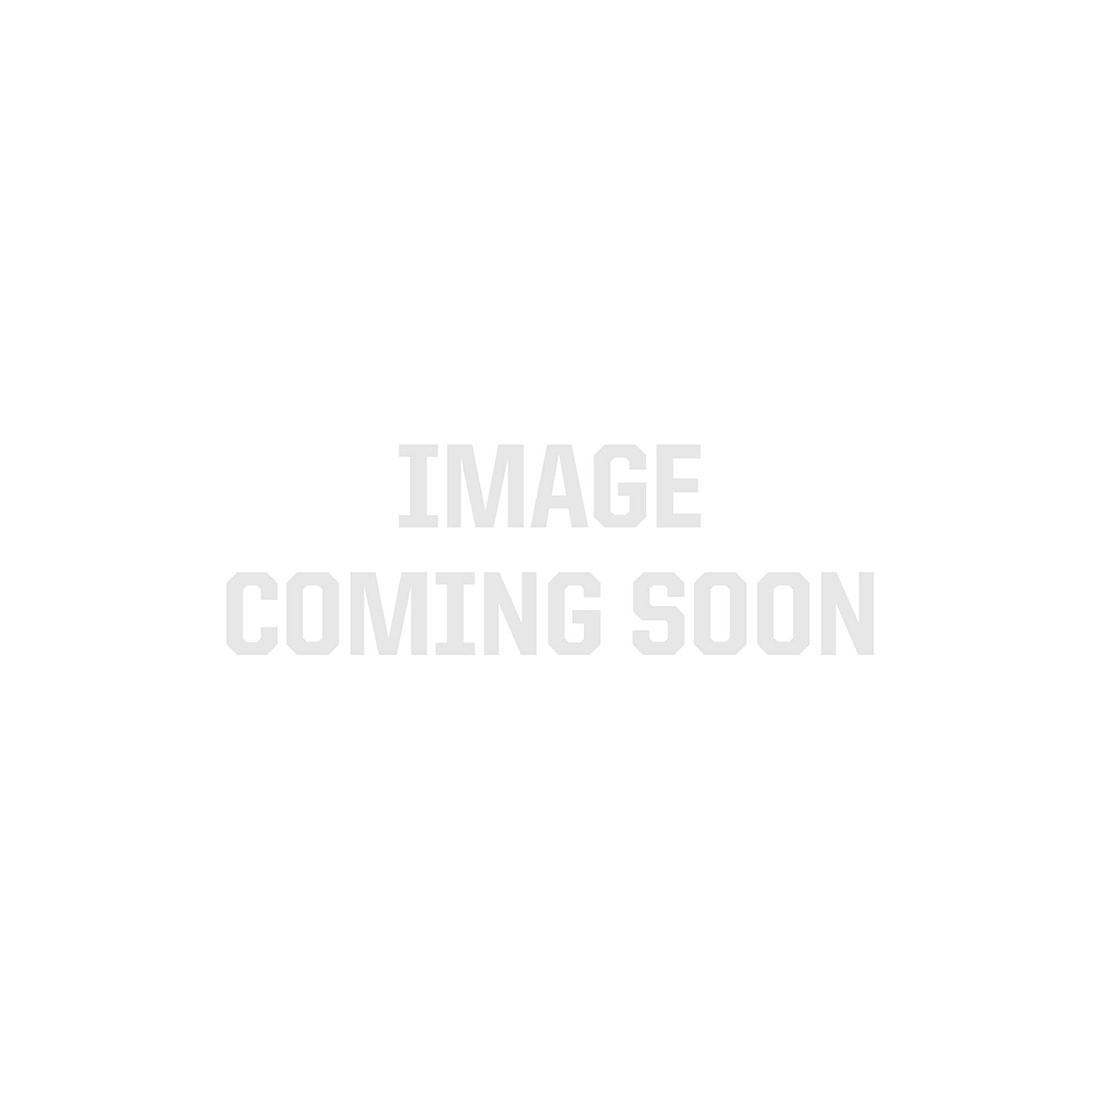 Universal Dimming Driver - 12 VDC - 5x60W